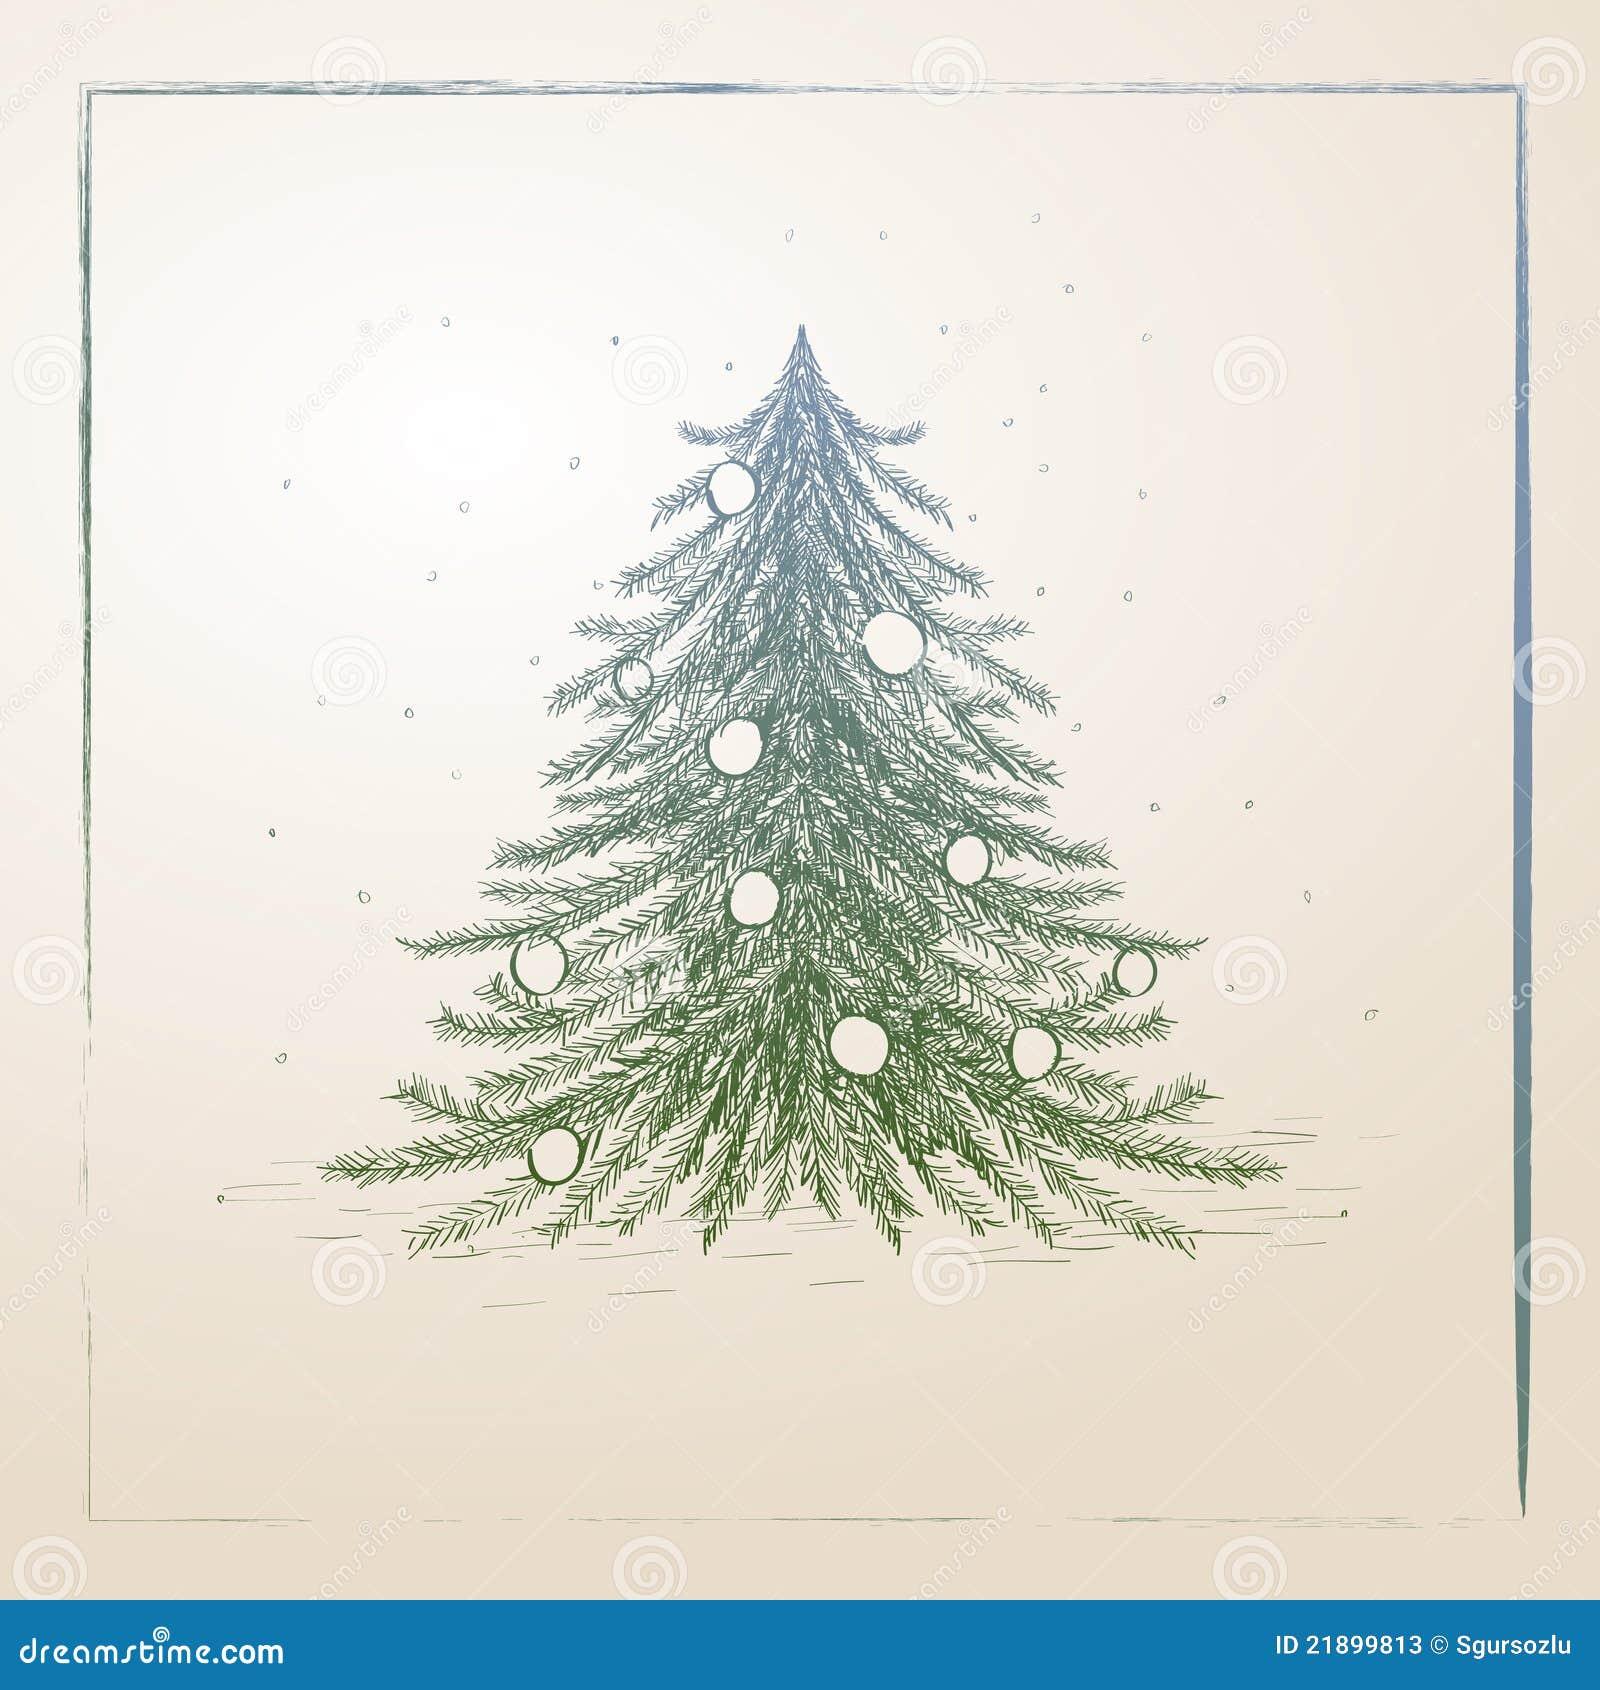 Uncategorized Drawn Christmas Trees hand drawn christmas tree stock photos image 21899813 royalty free photo download tree